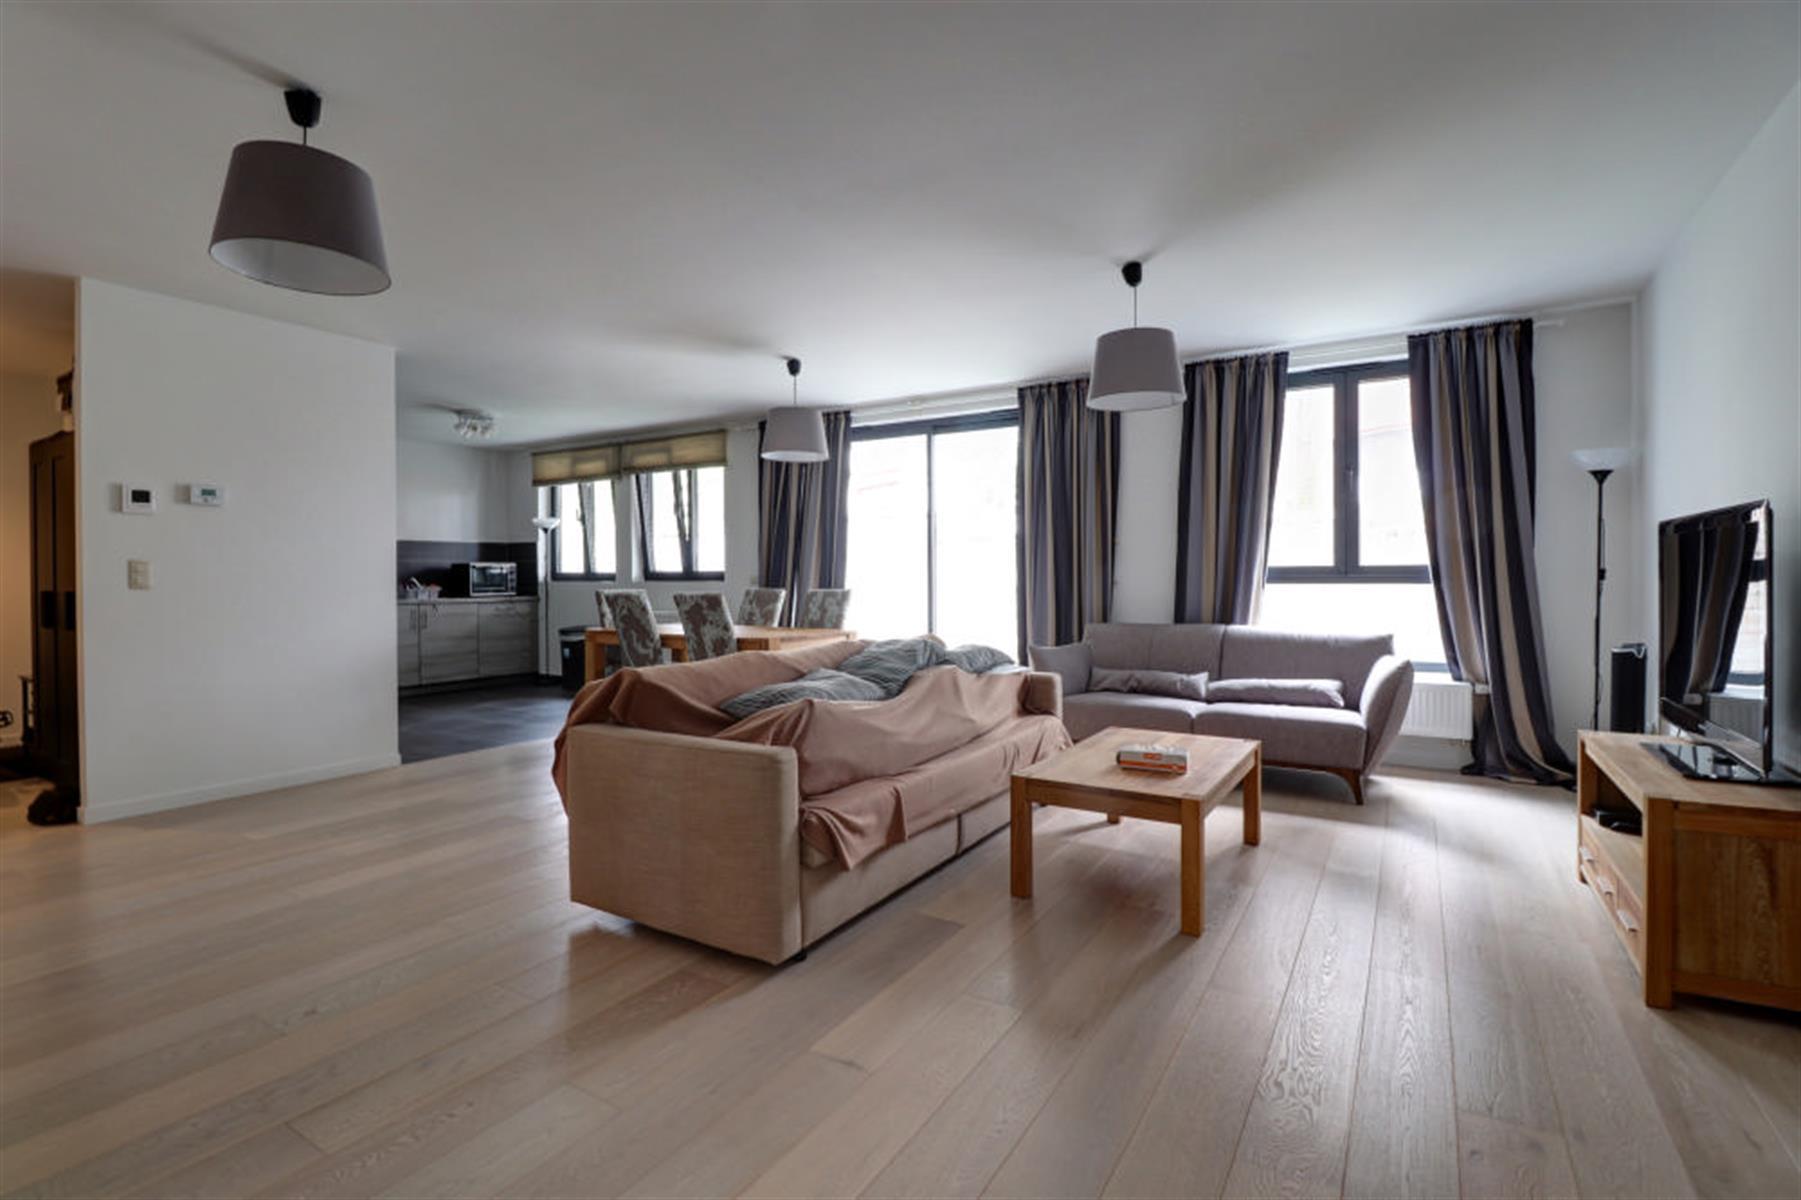 Flat - Etterbeek - #3905829-4